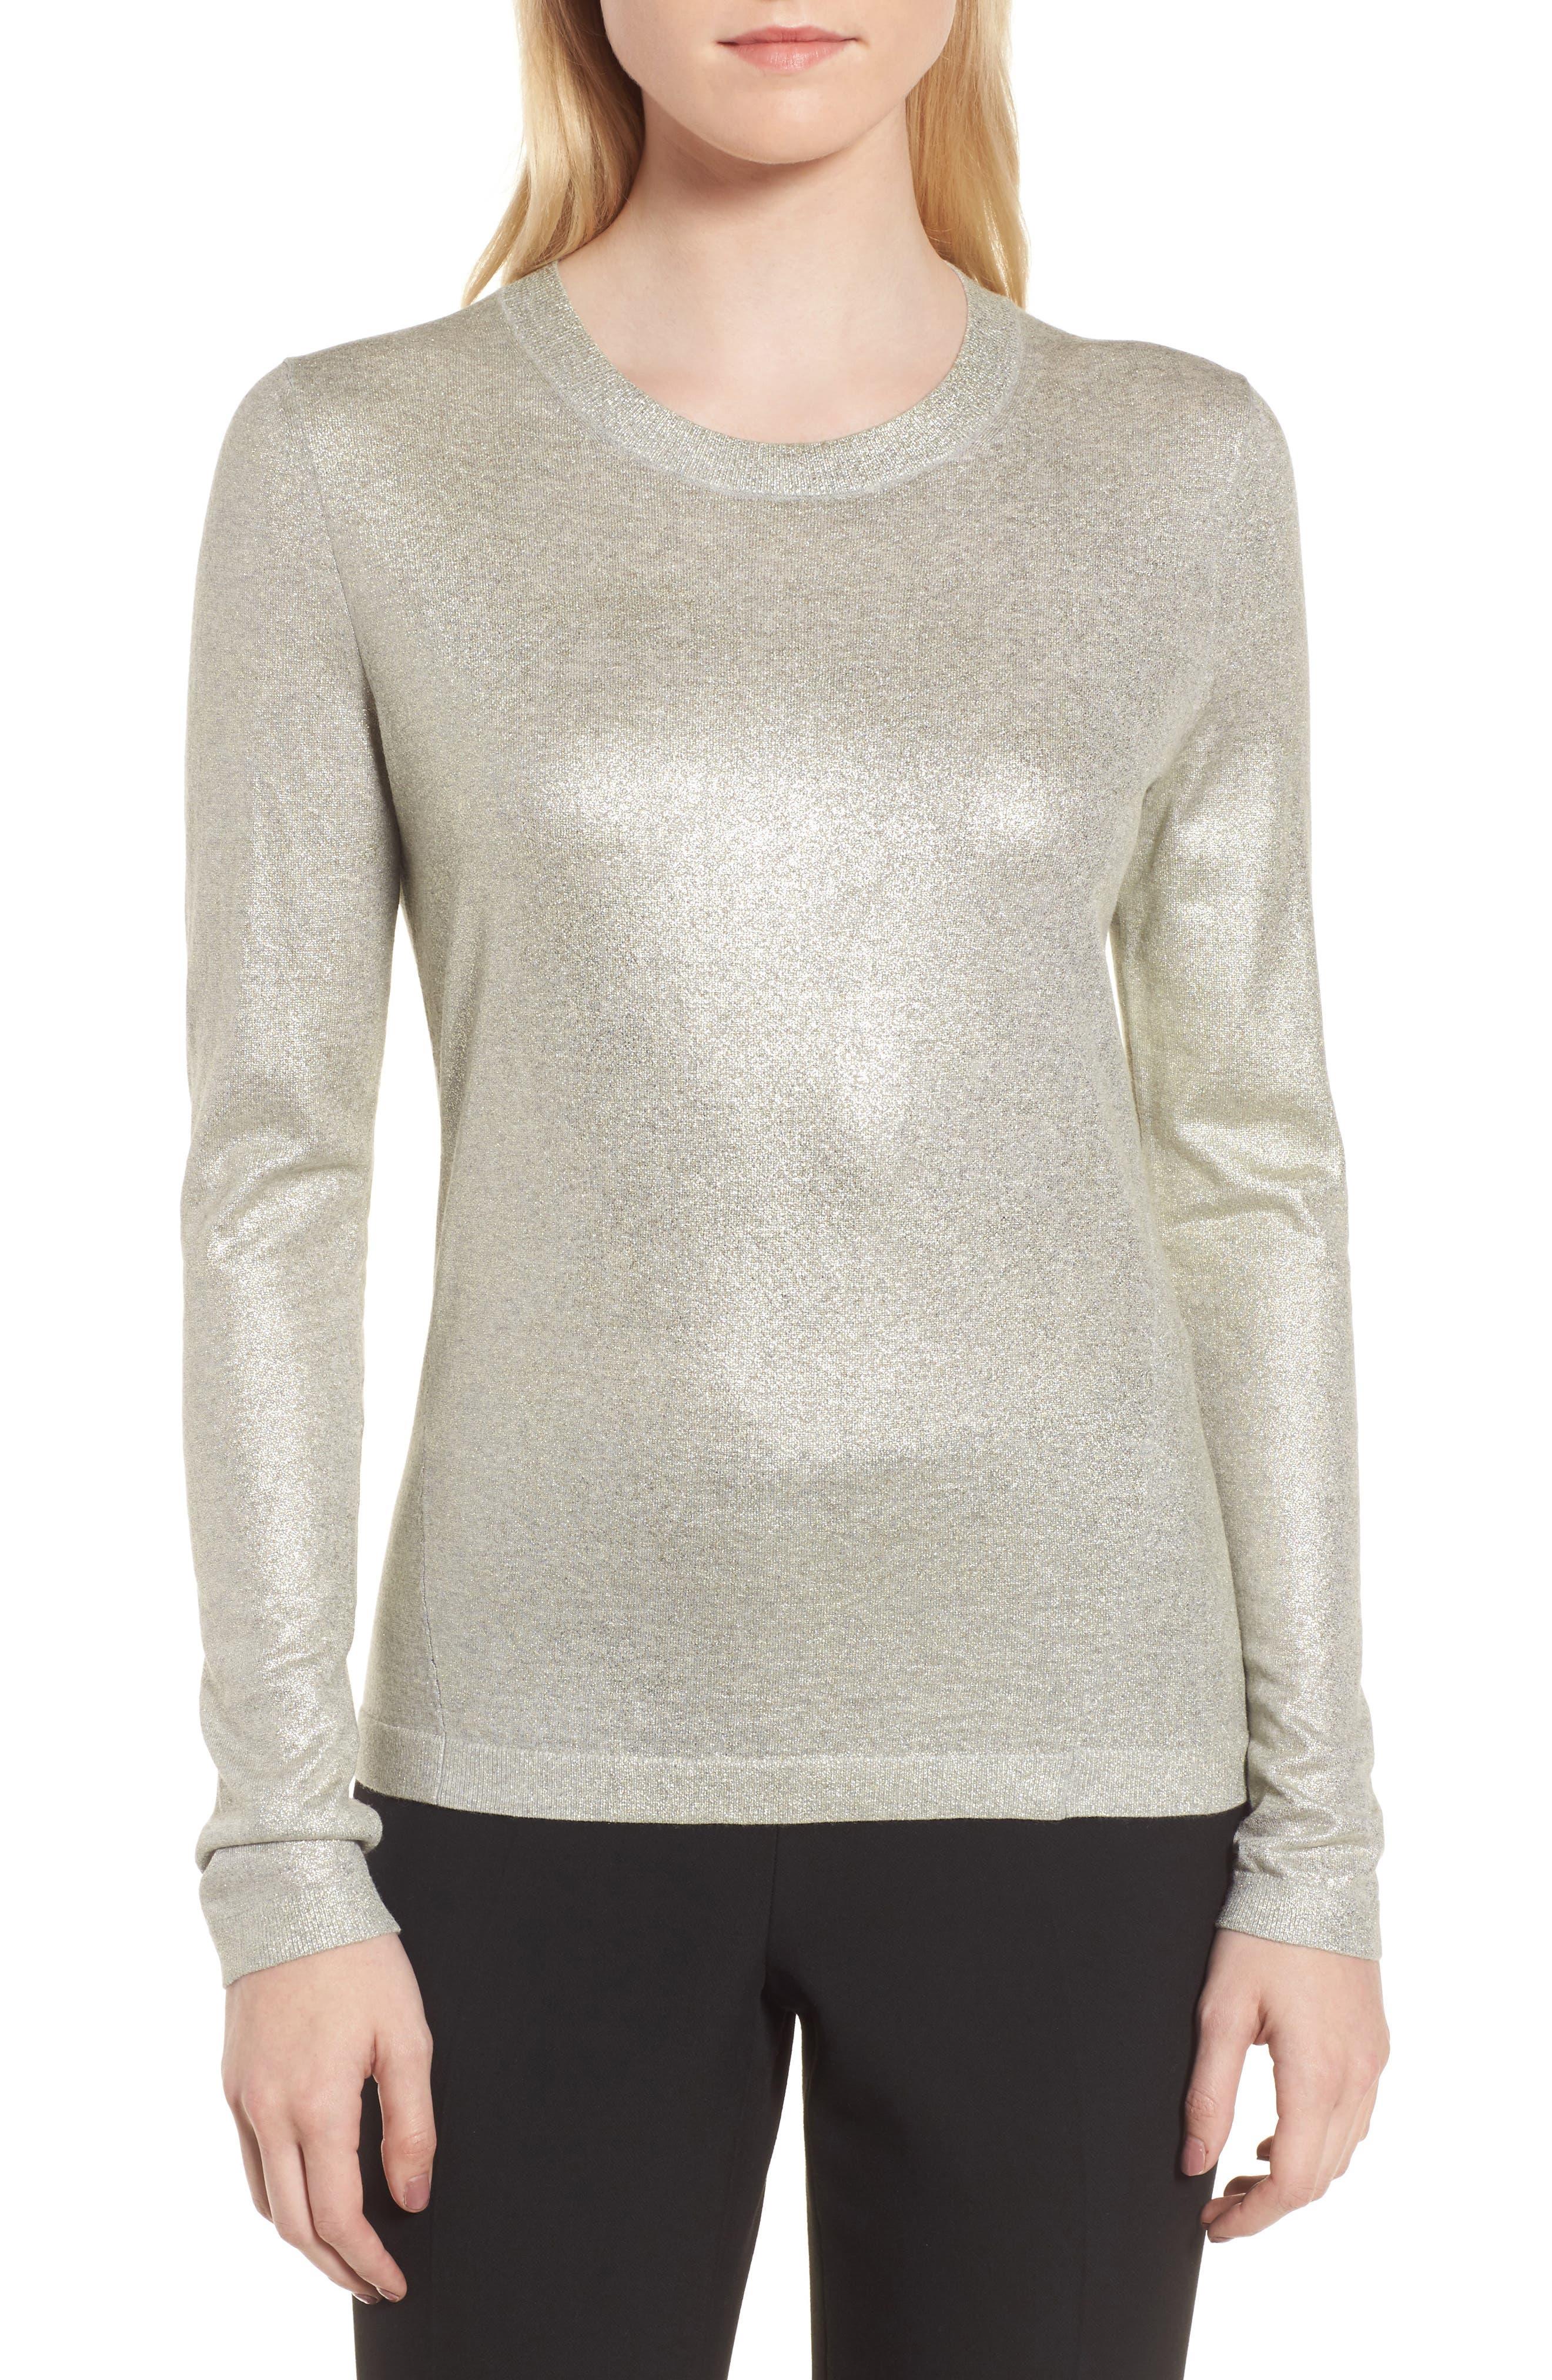 Fadine Wool Crewneck Sweater,                             Main thumbnail 1, color,                             Cozy Grey Melange